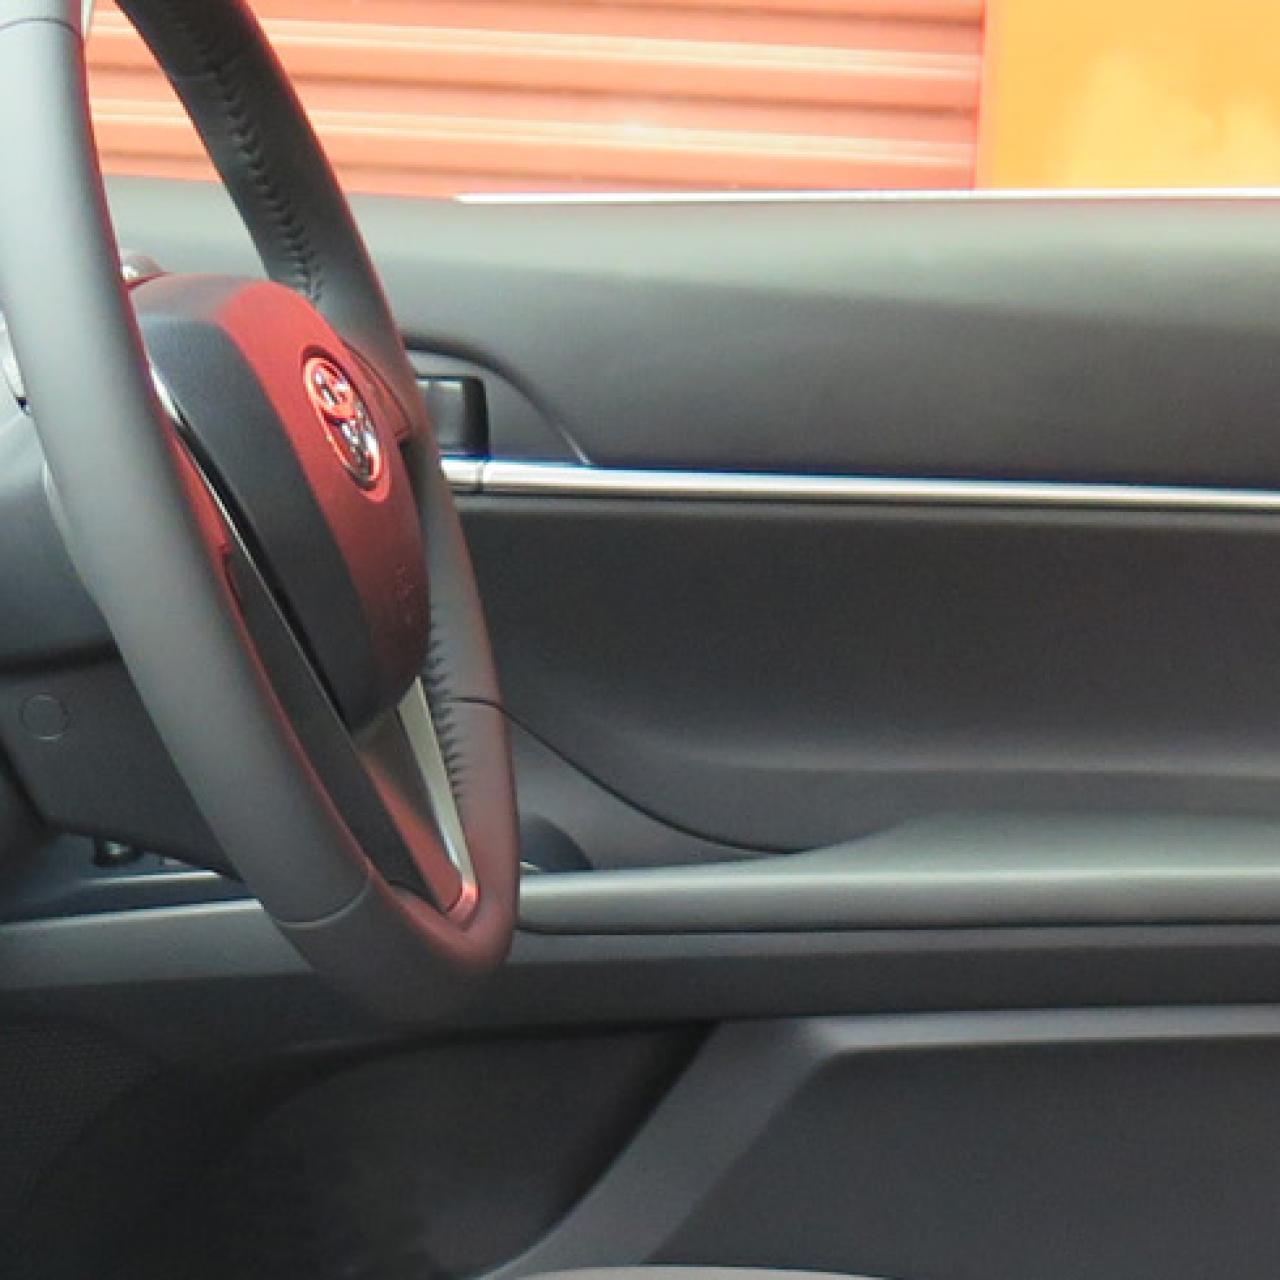 Sharper, smarter Toyota Camry